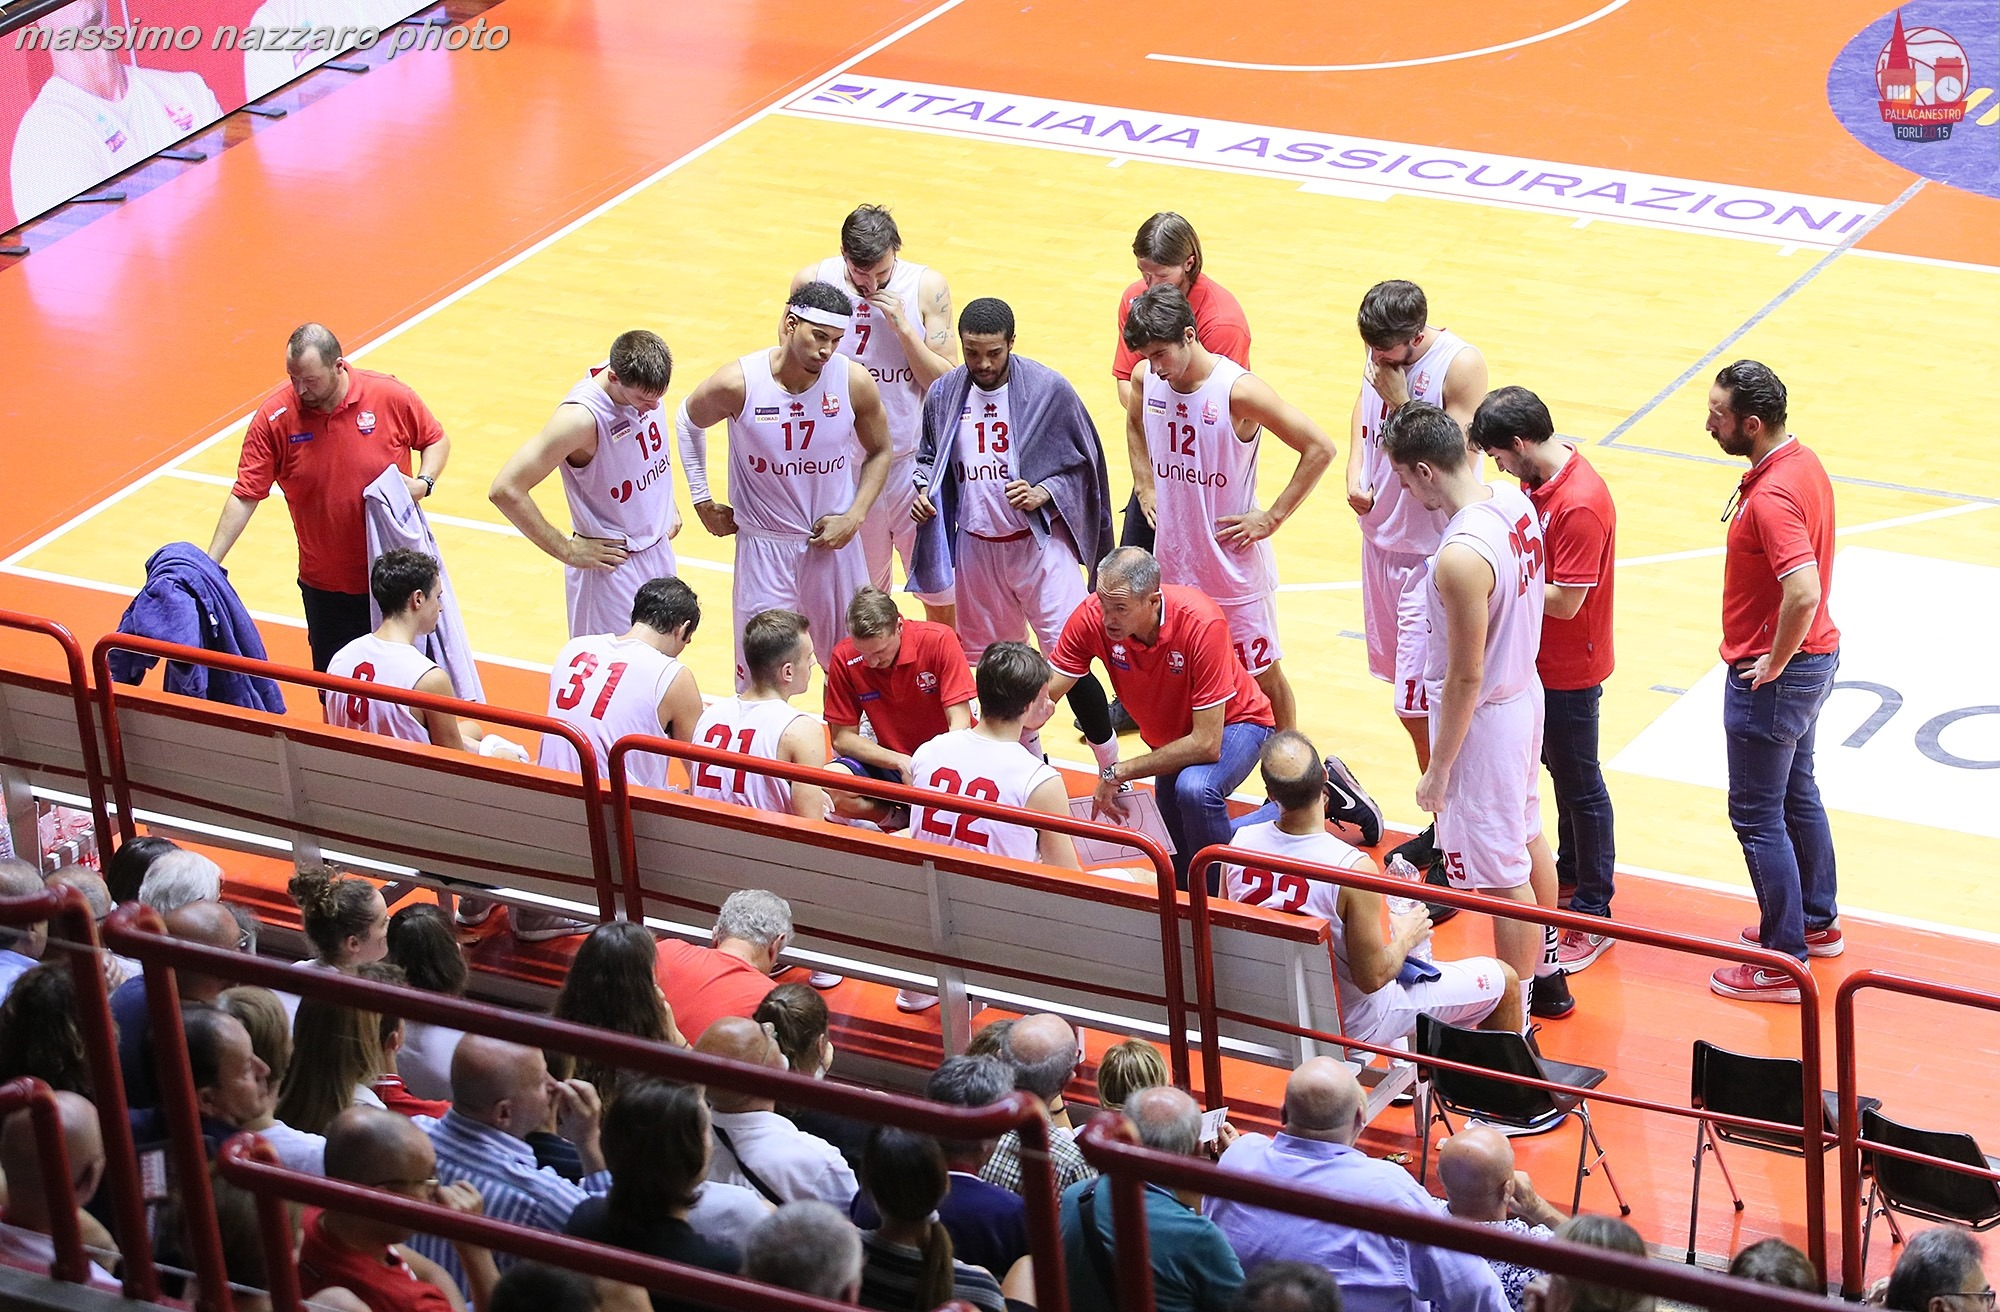 Unieuro-Basket